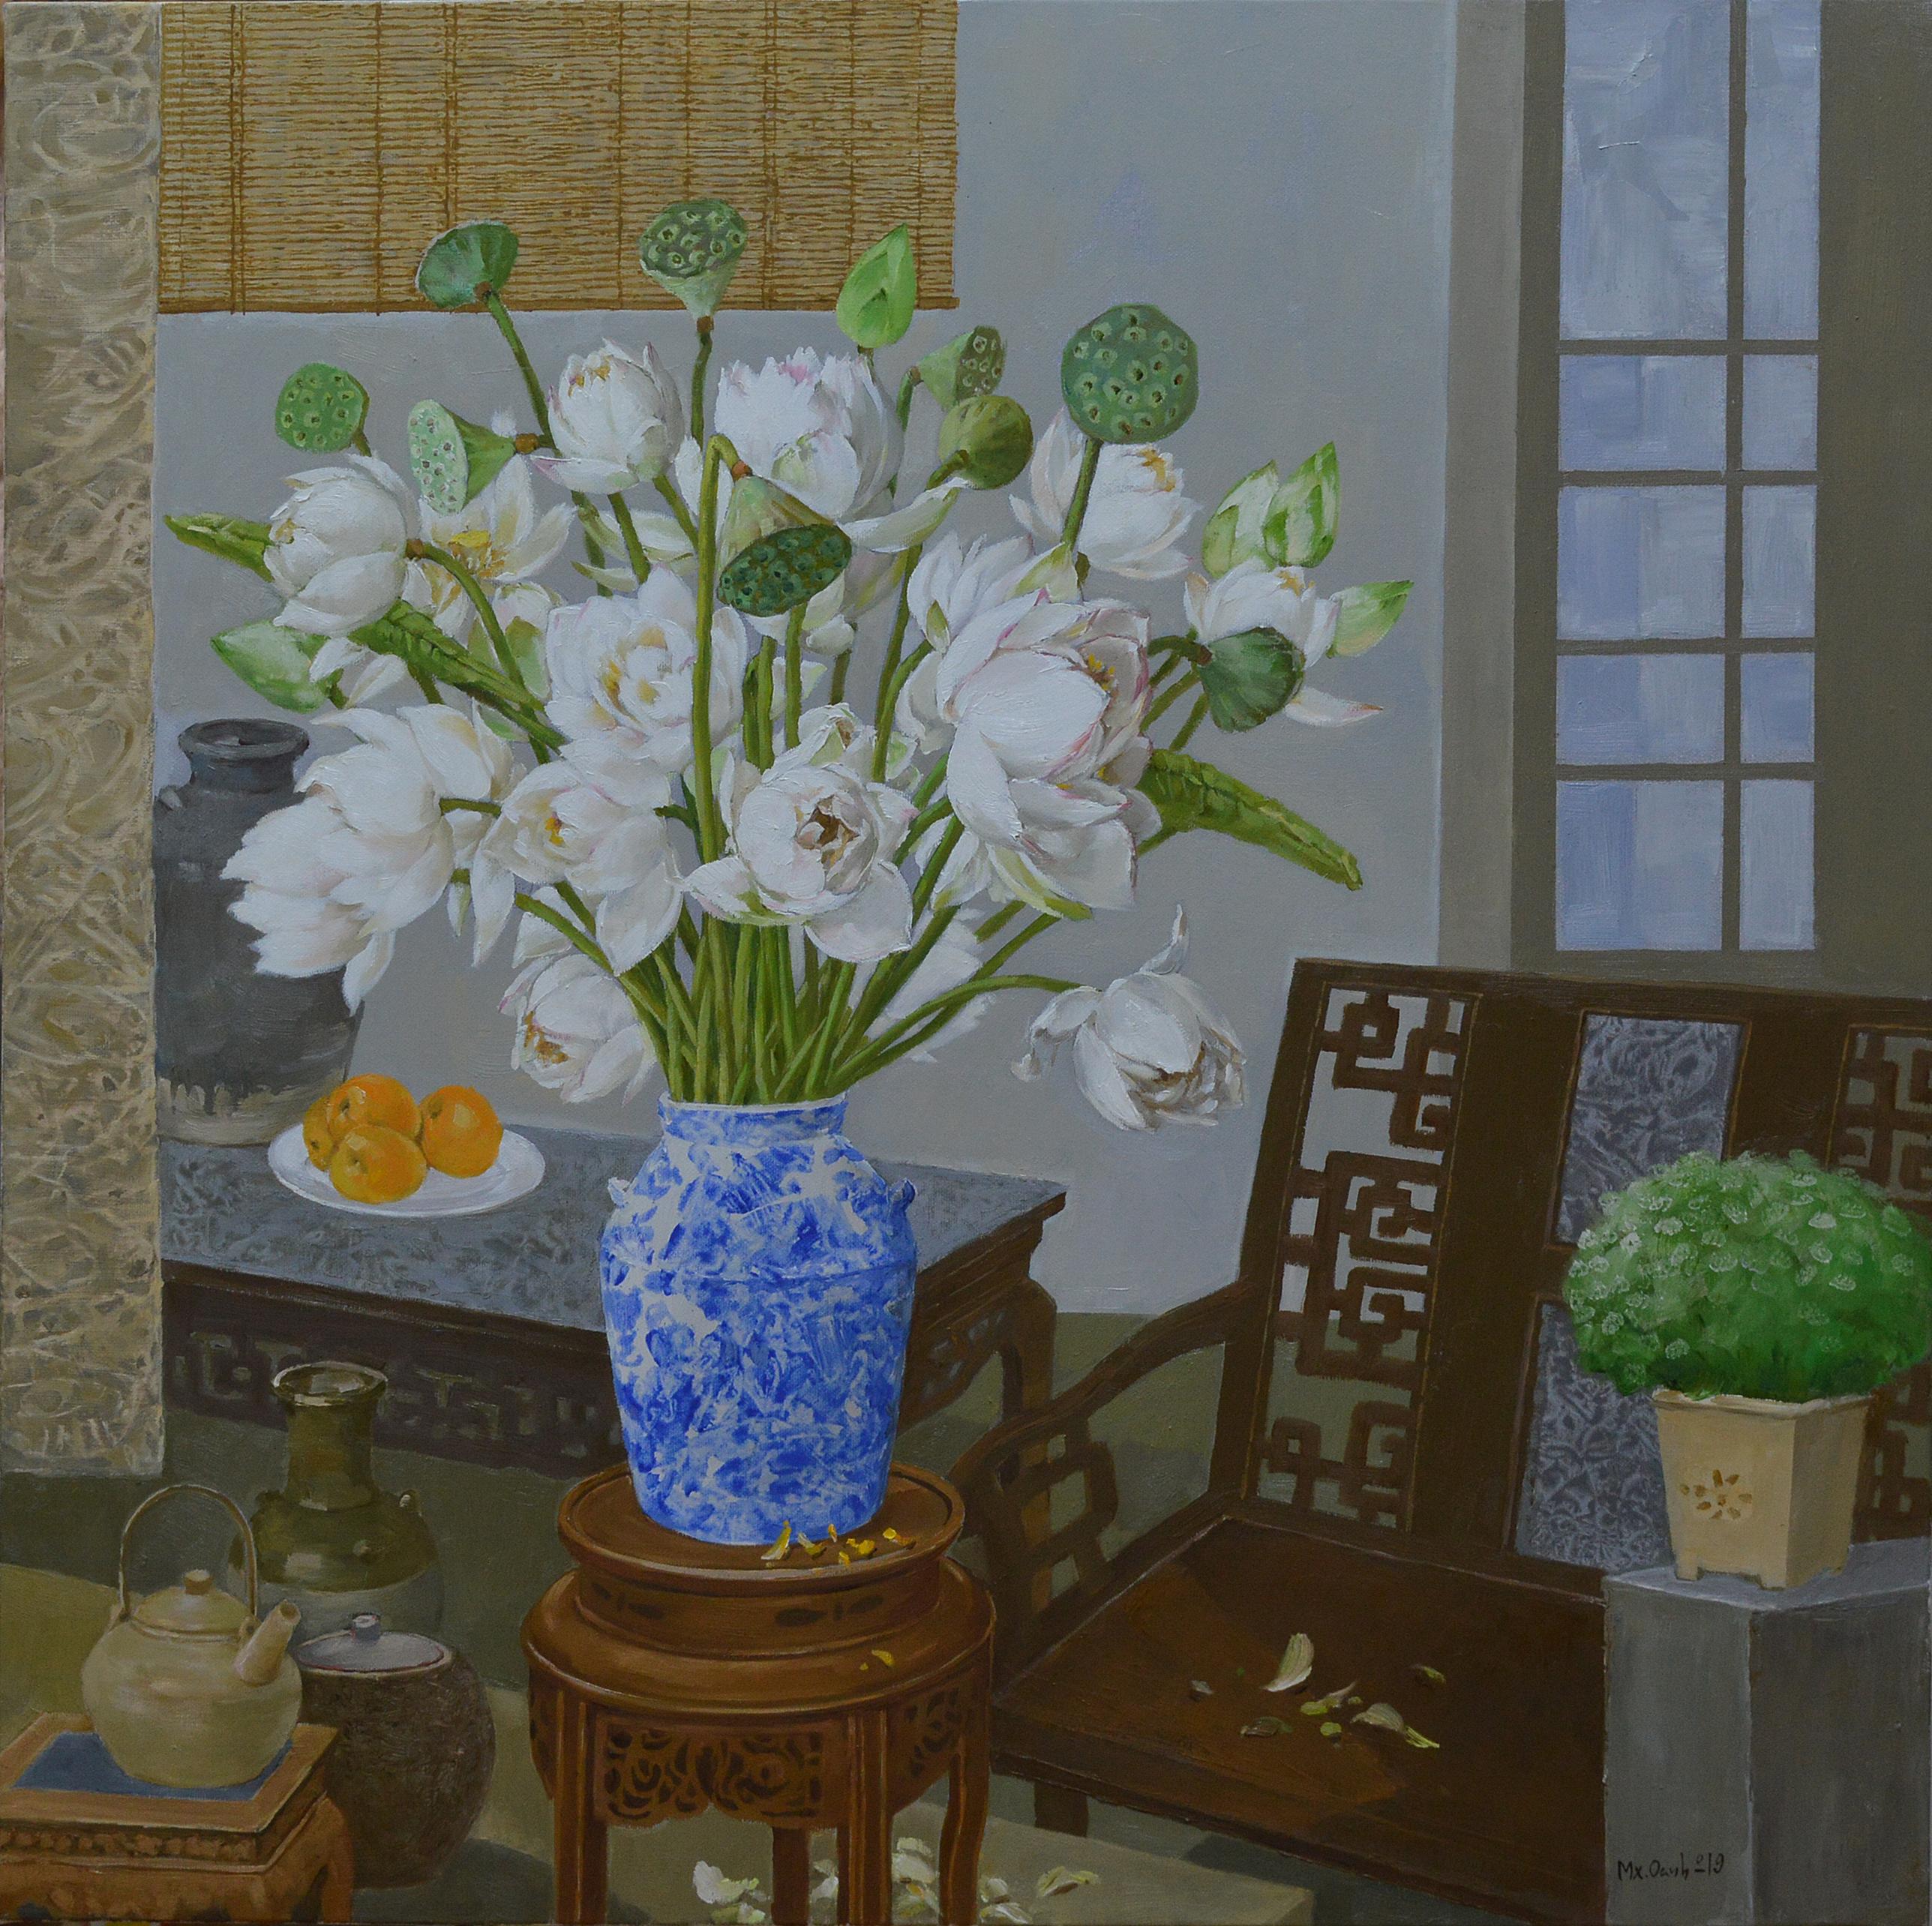 Summer Flowers No. 3 | Hoa Mùa Hạ 03